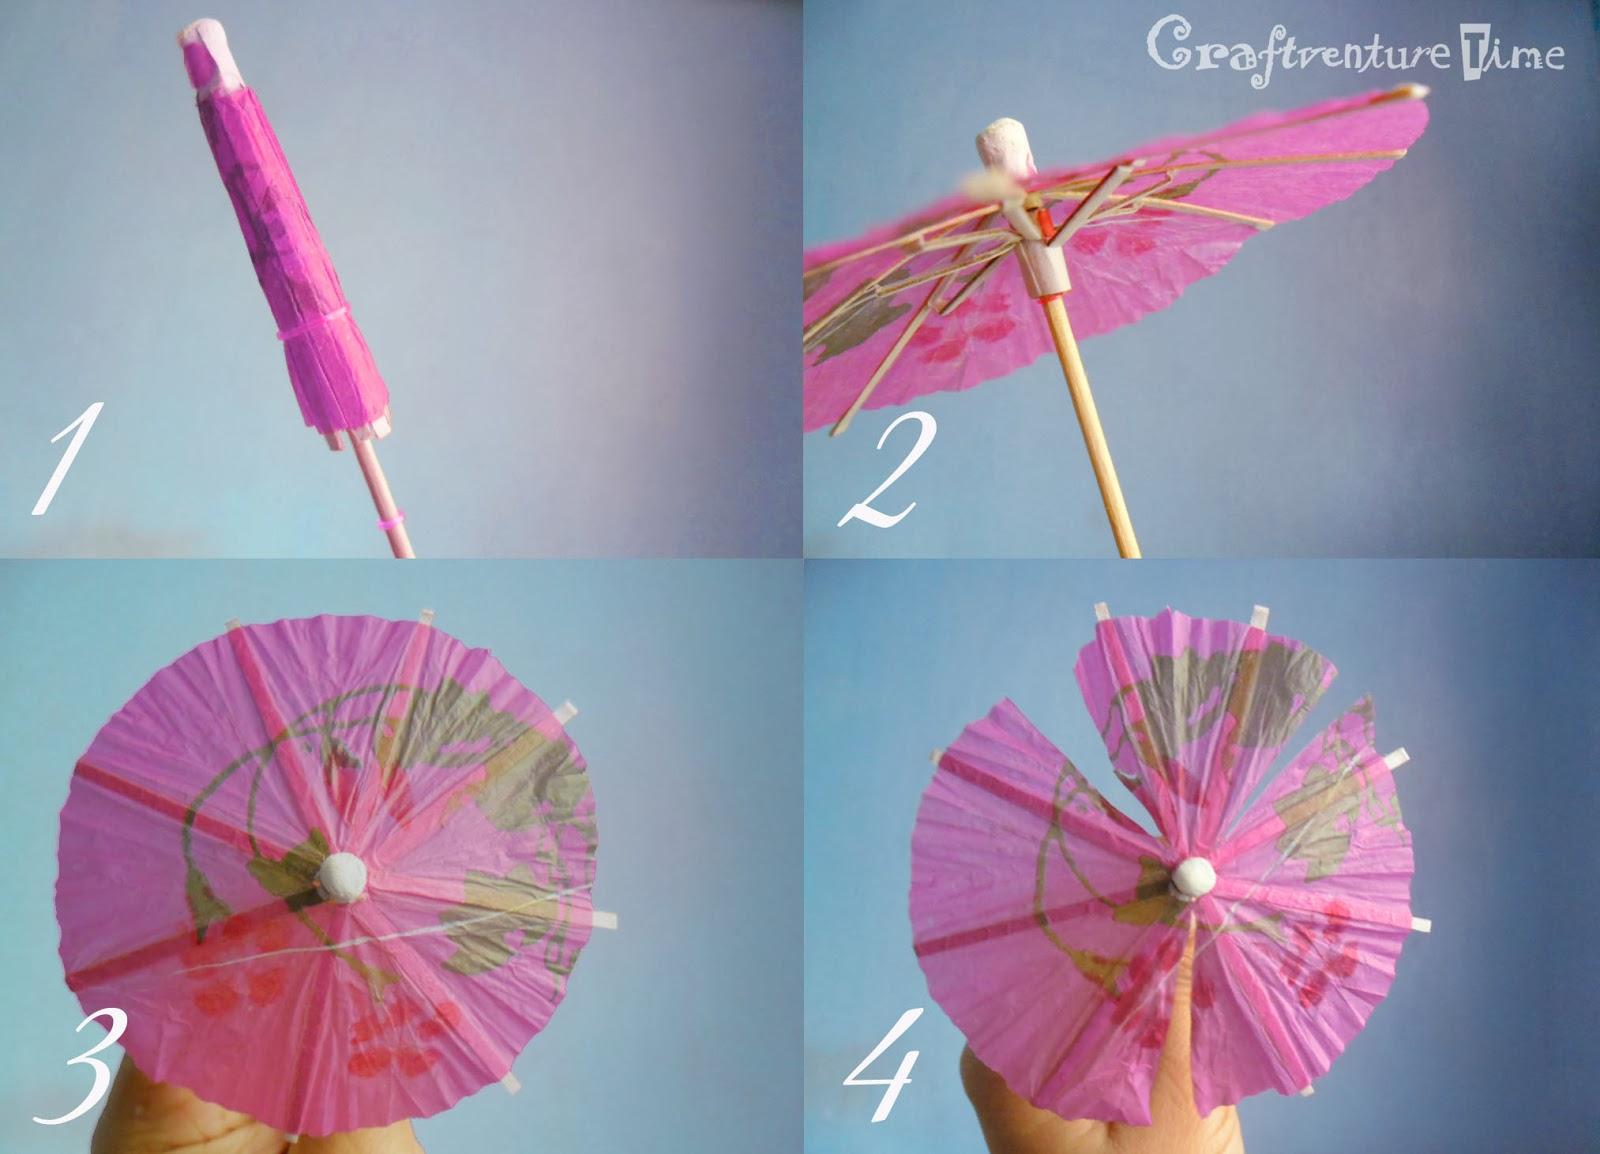 paper umbrella Oil-paper umbrella (chinese: 油紙傘, pinyin: yóuzhǐsǎn, mandarin pronunciation: [i̯ǒu̯ʈʂɨ̀sàn]) is a type of paper umbrella that originated from chinait subsequently spread across several.